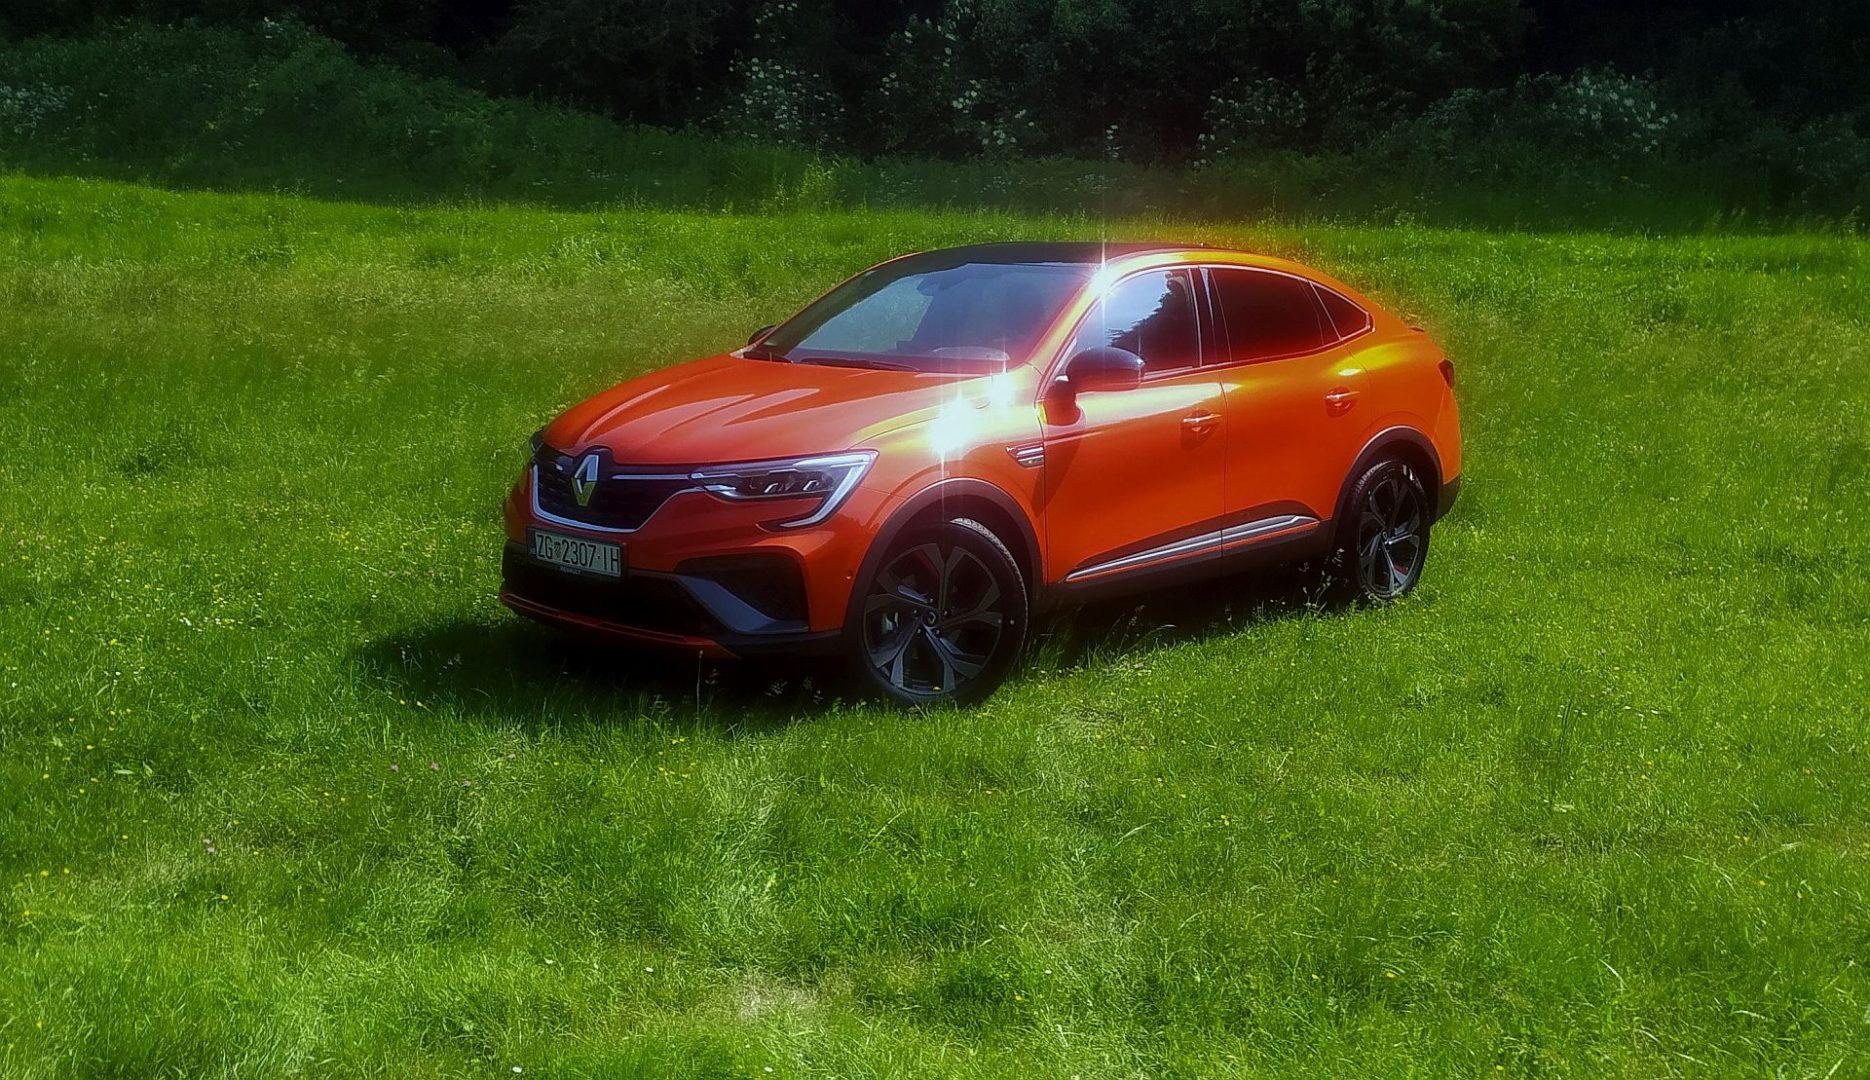 Stigao je coupe SUV dostupan svima: Renault Megane Conquest